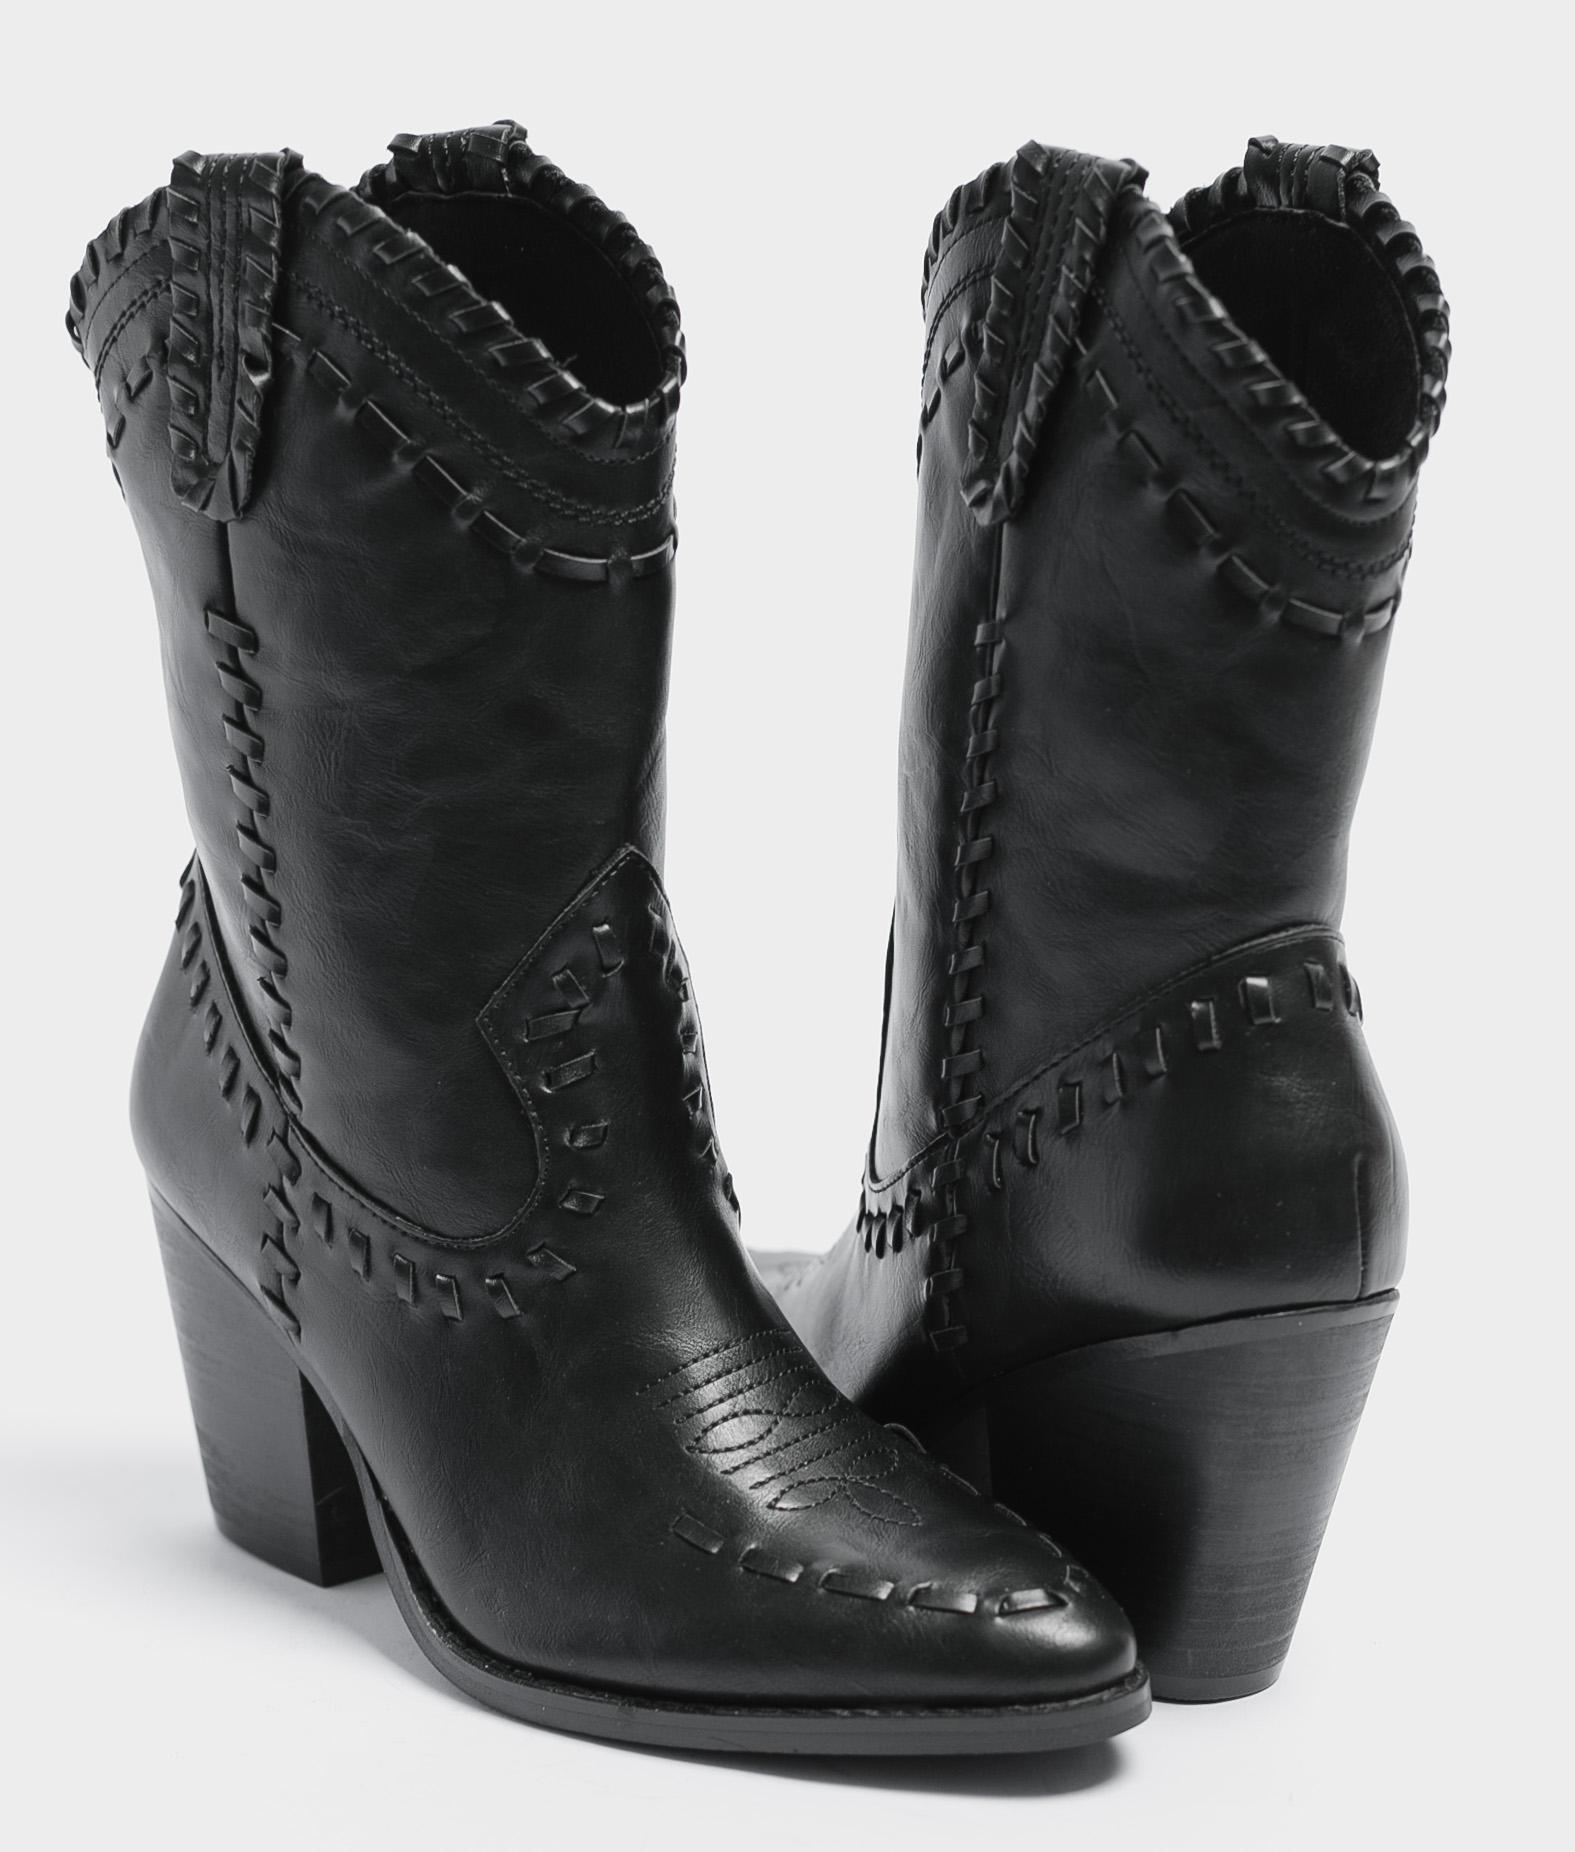 Croma Small Boot - Black